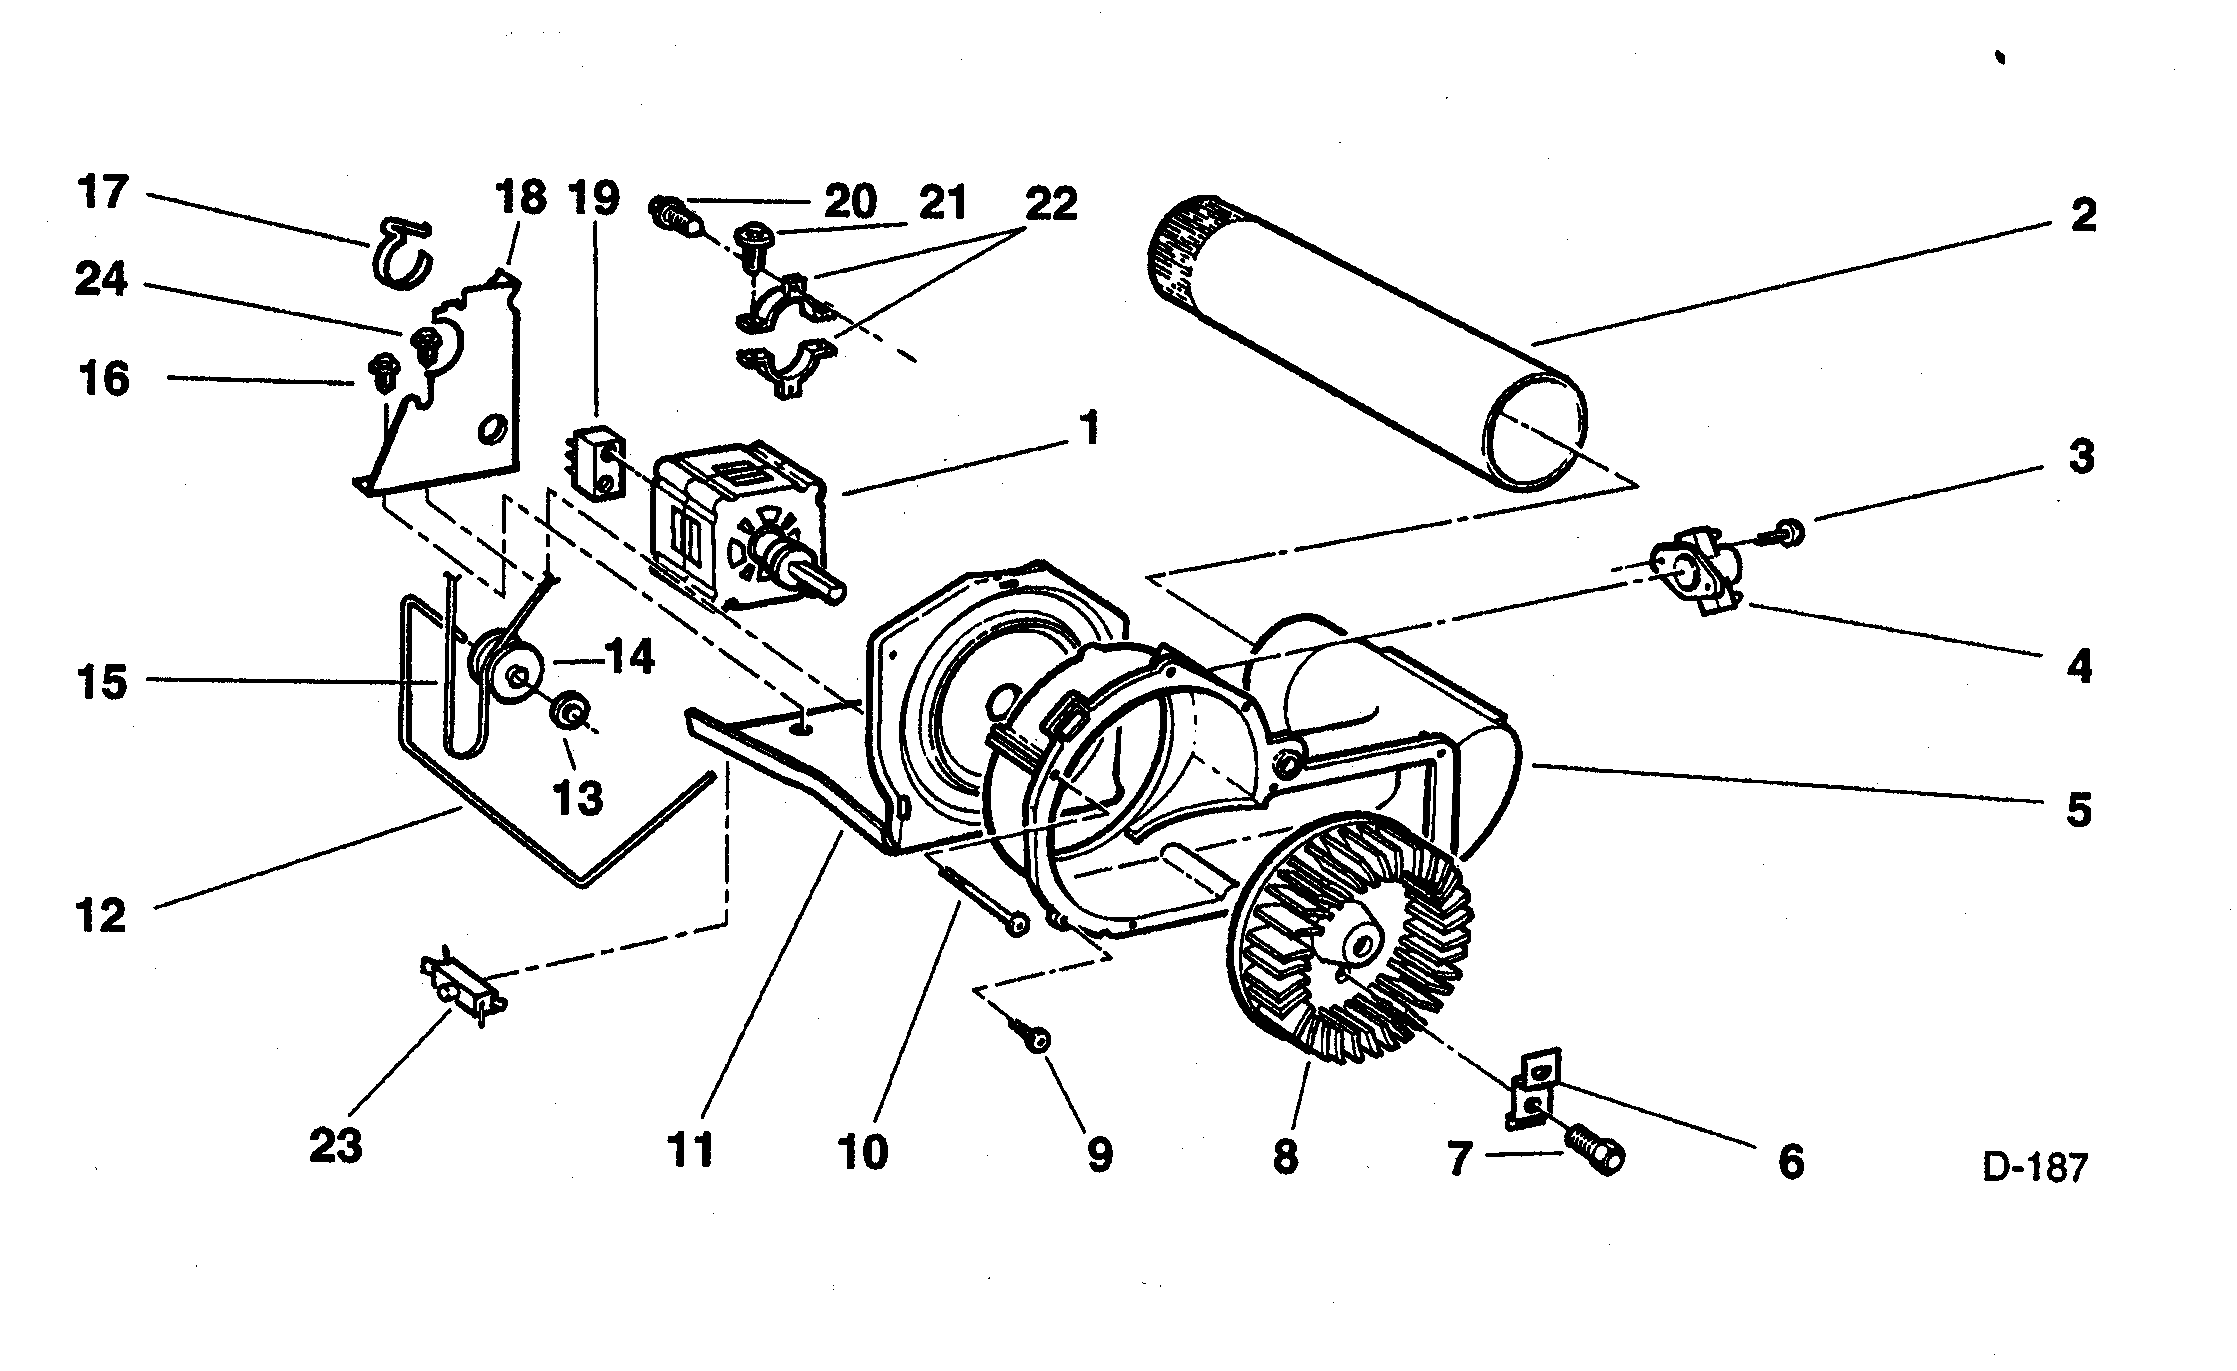 How To Change Drive Belt On Dryer Model De05